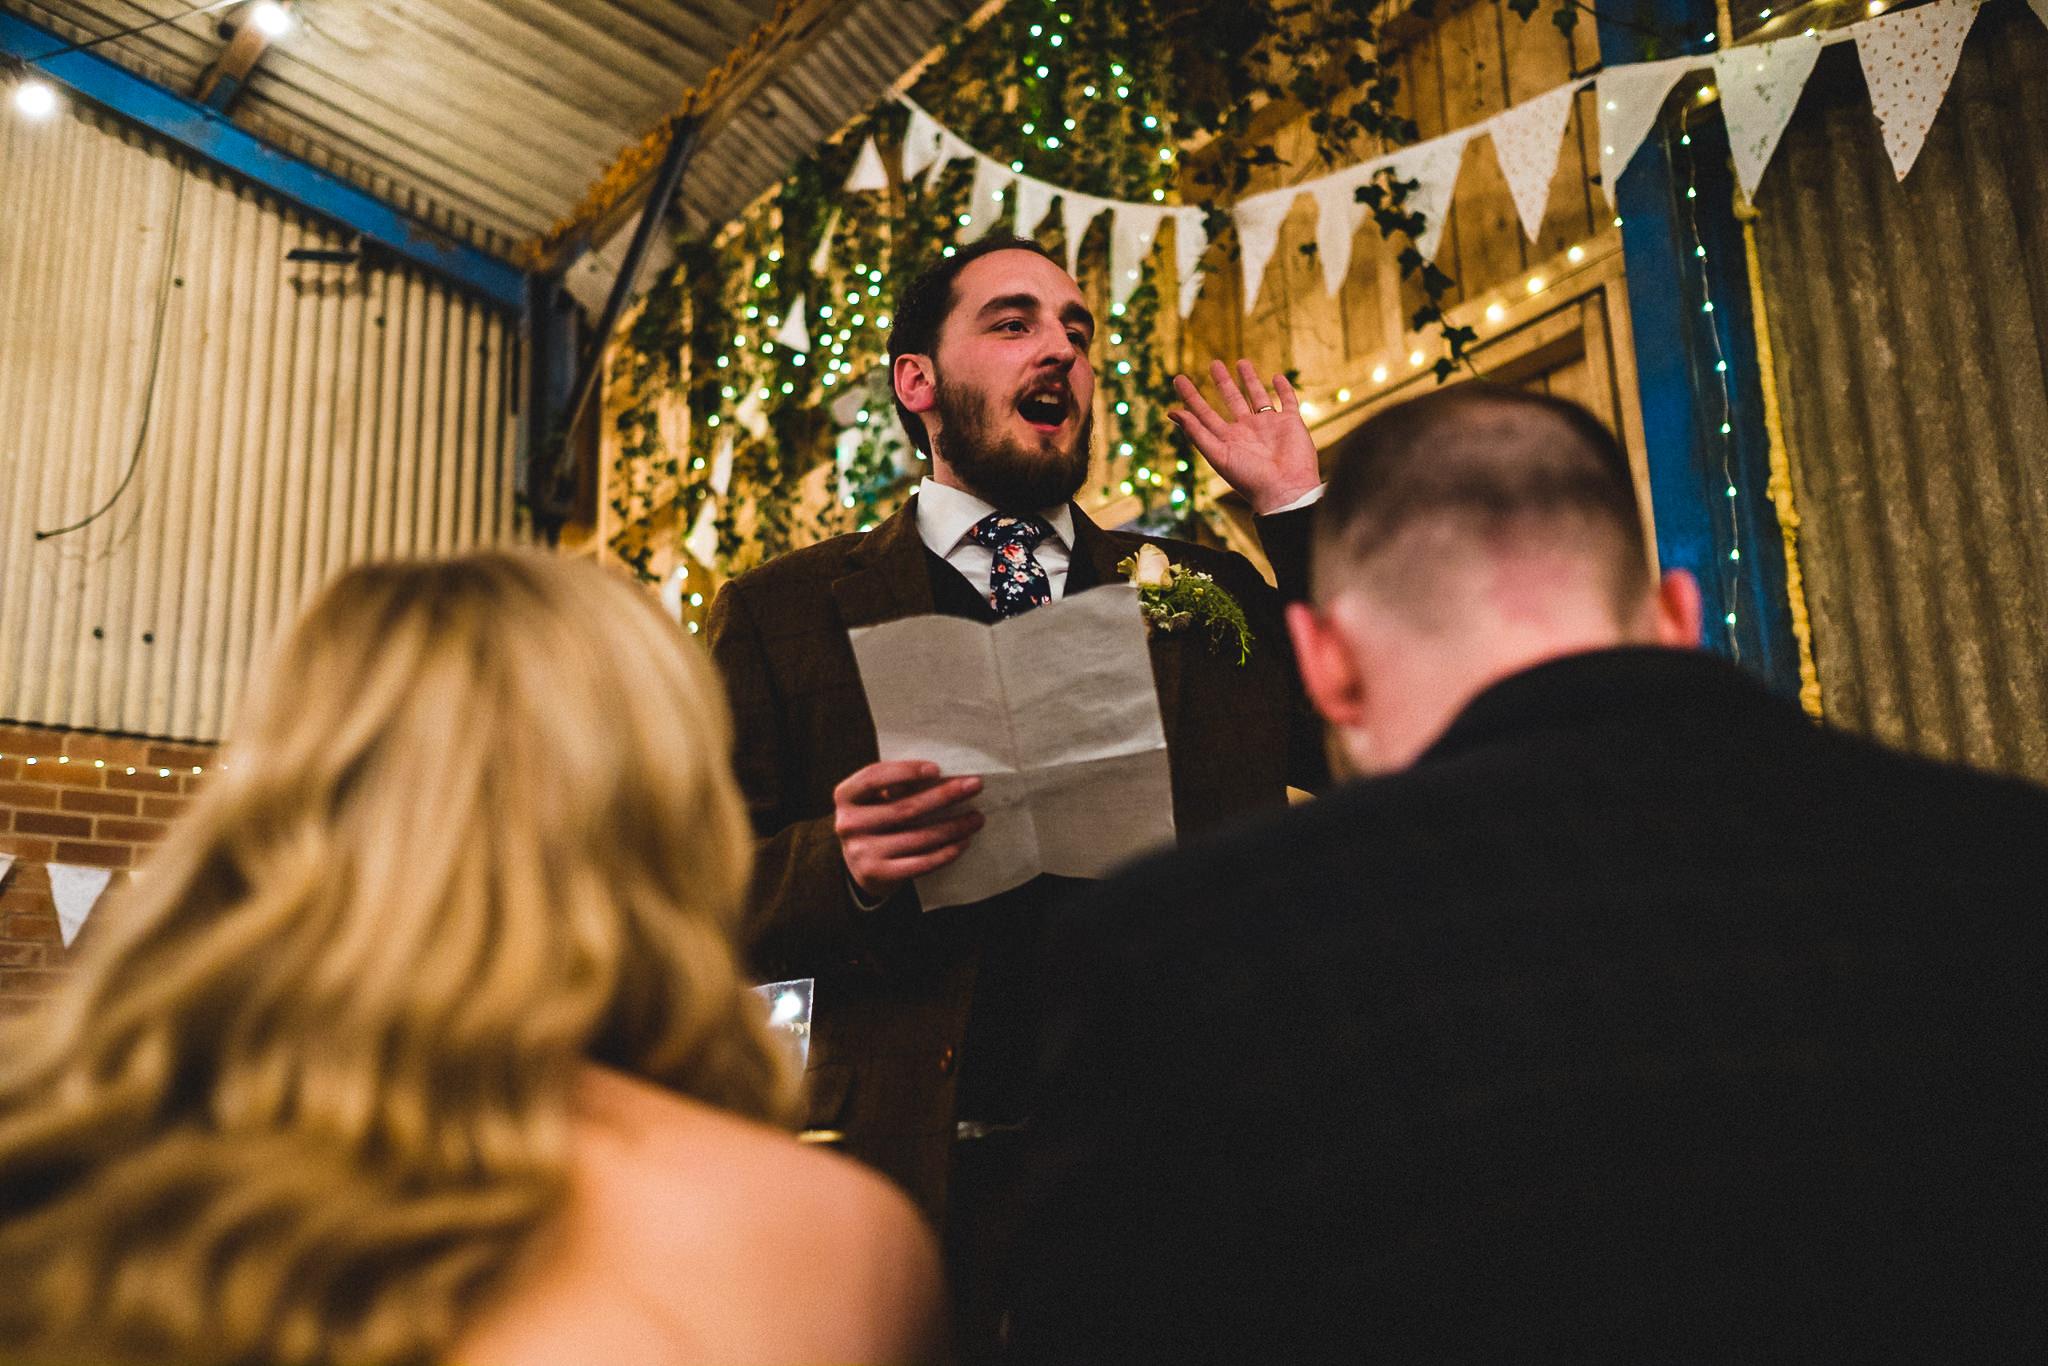 Groom giving hilarious wedding speech